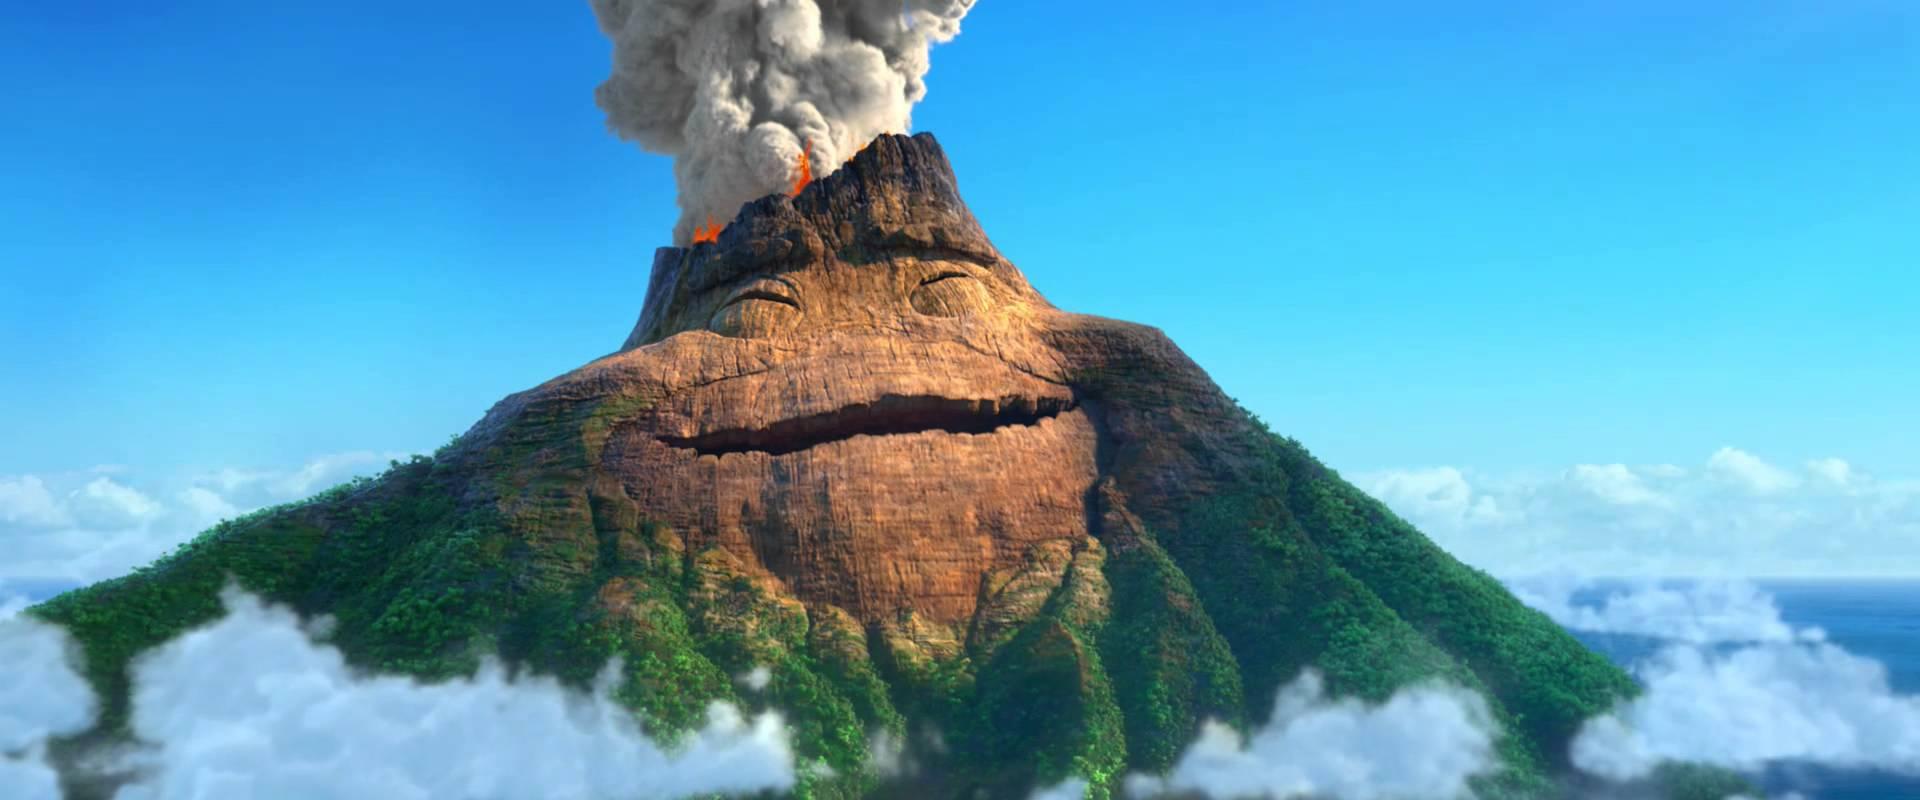 maxresdefaultA8KGP0HU Pixar bringt mit dem neuen Kurzfilm Lava nun Vulkane zum Singen